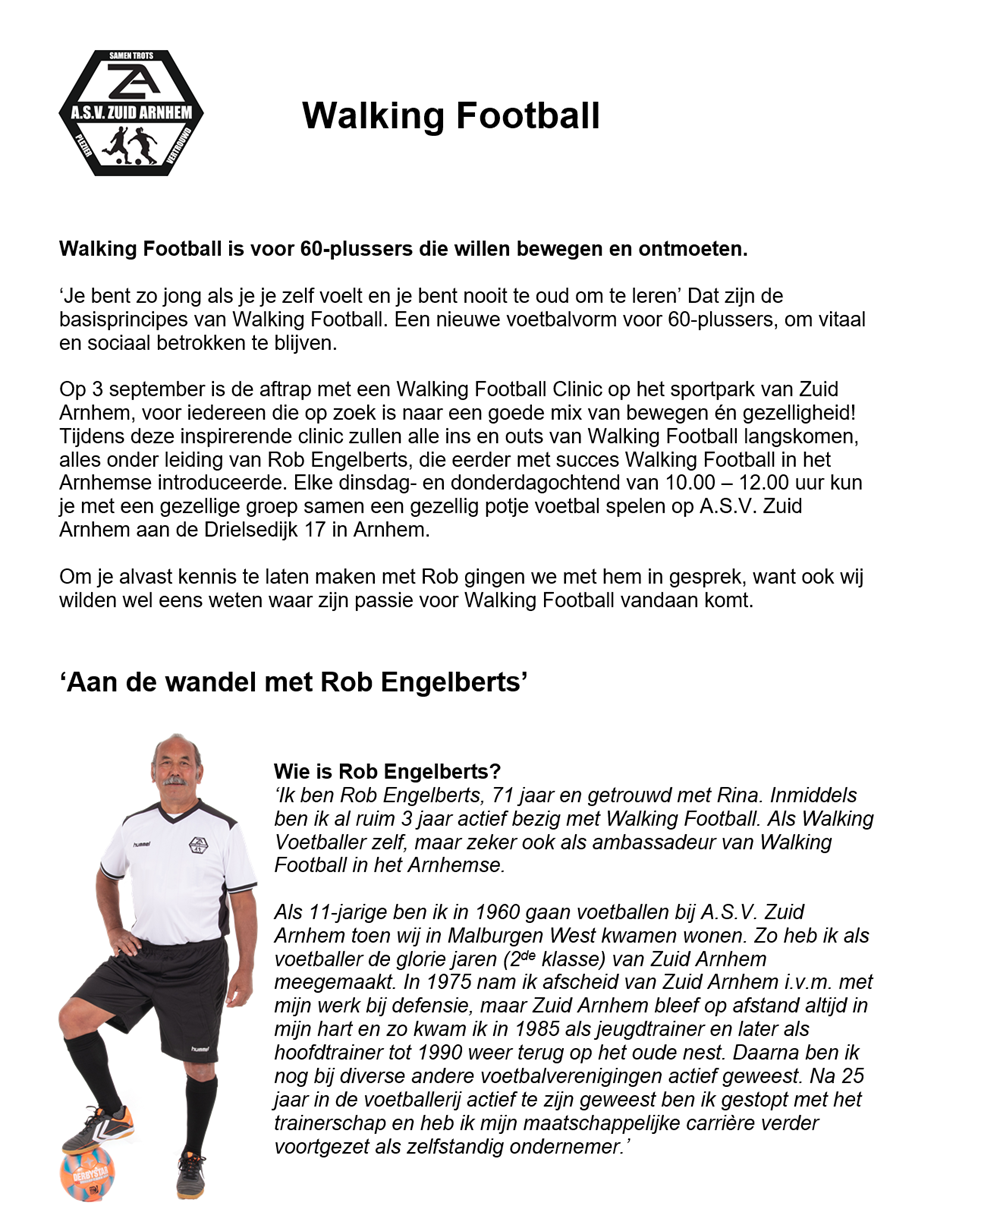 Bewerkt_Walking_Football_Rob_Engelberts_-_Interview_juli_2021_Pagina-1.png